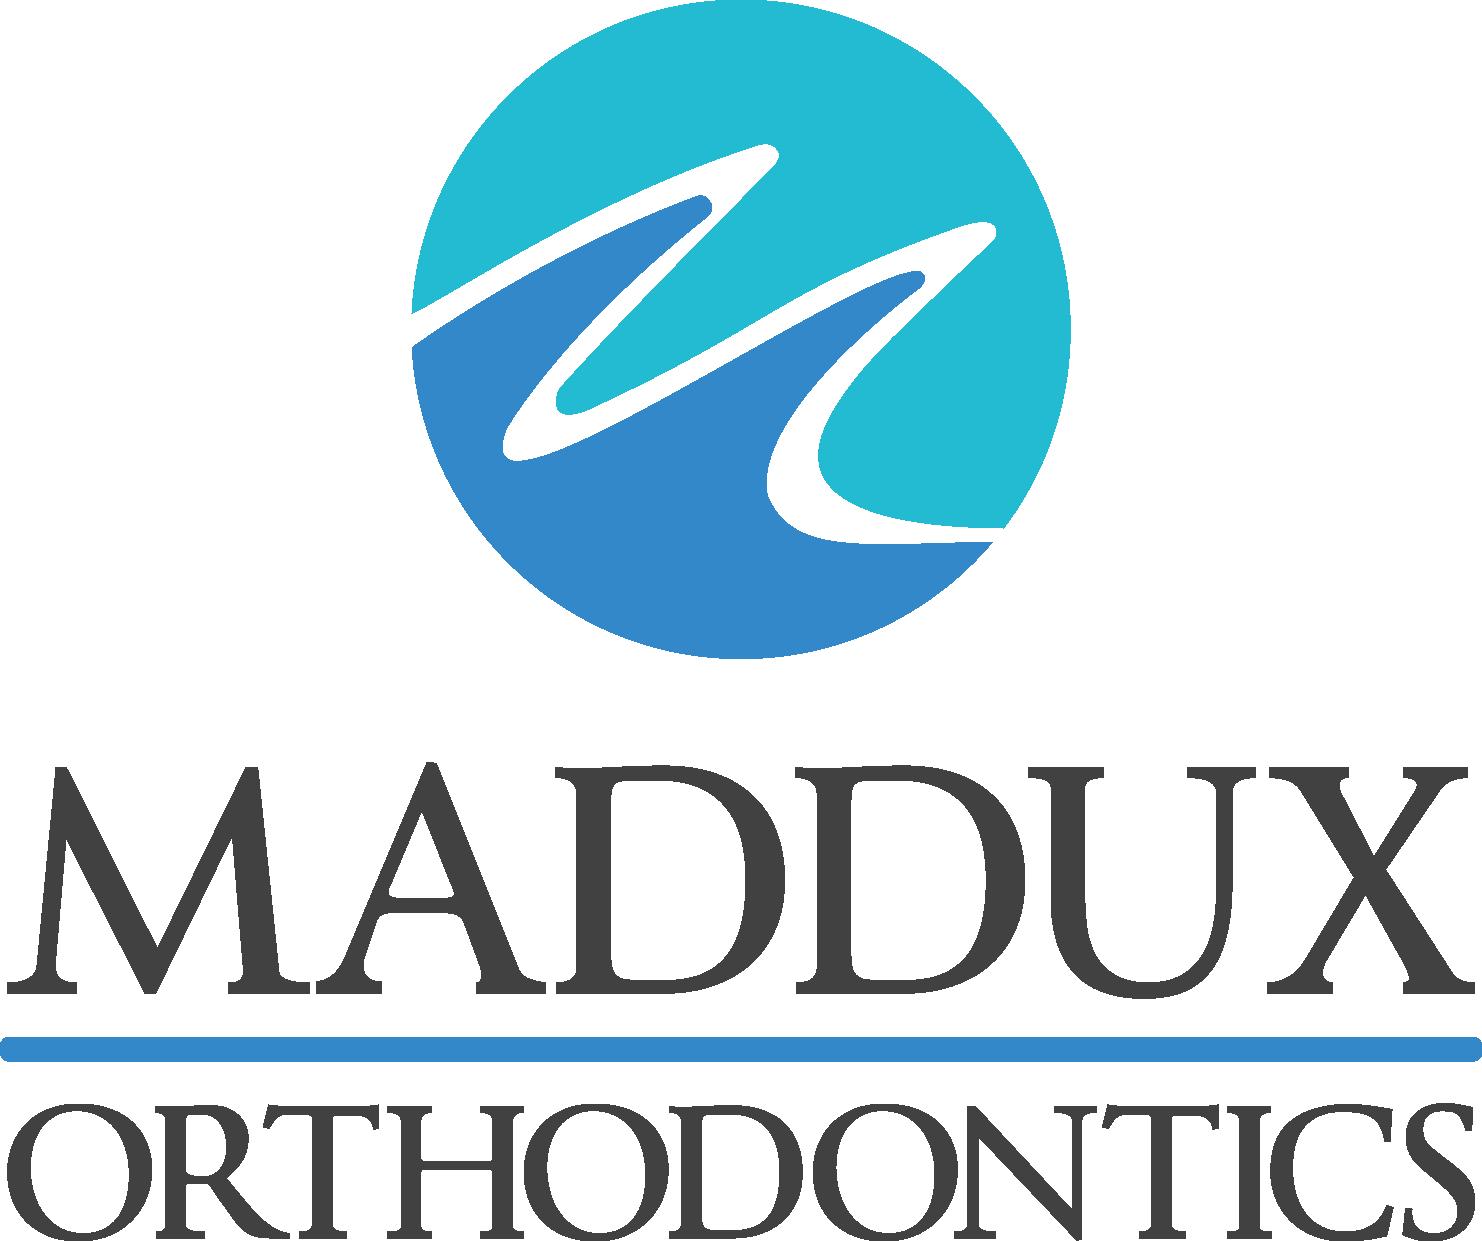 maddux_orthodontics_logo_stacked.png